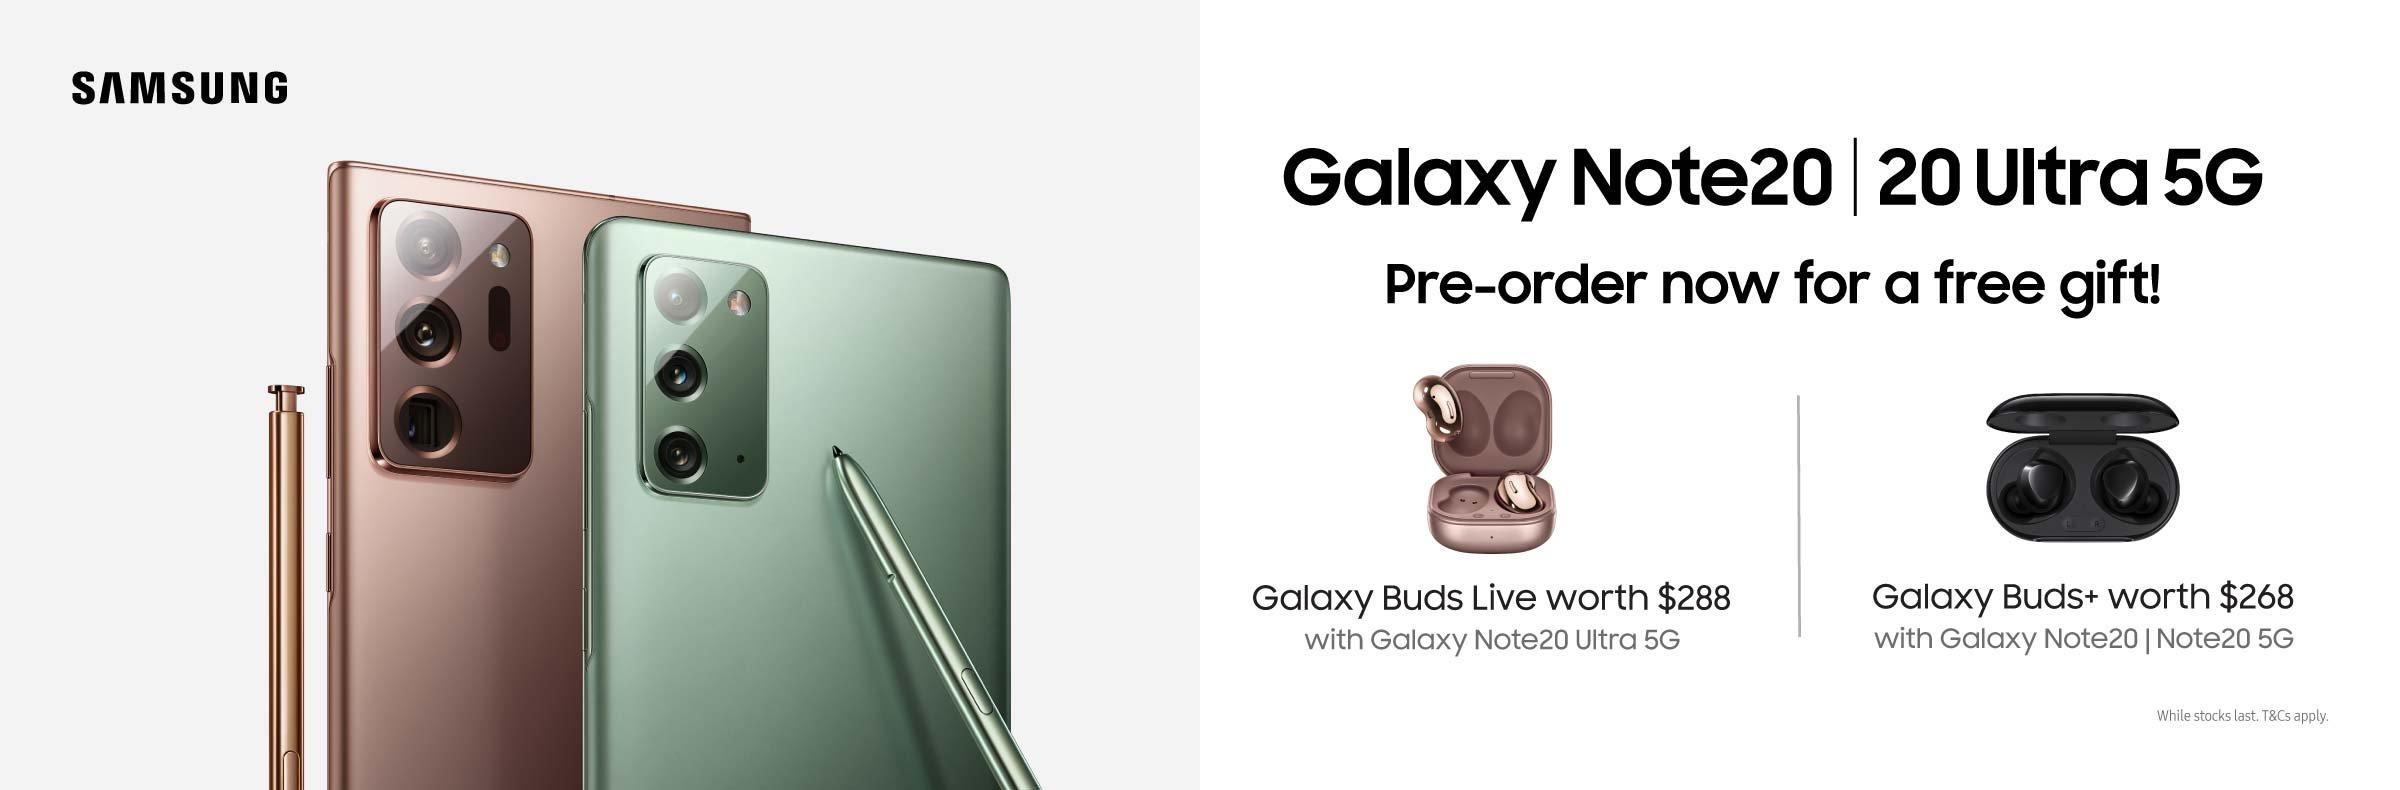 Samsung Note20 Pre-Order